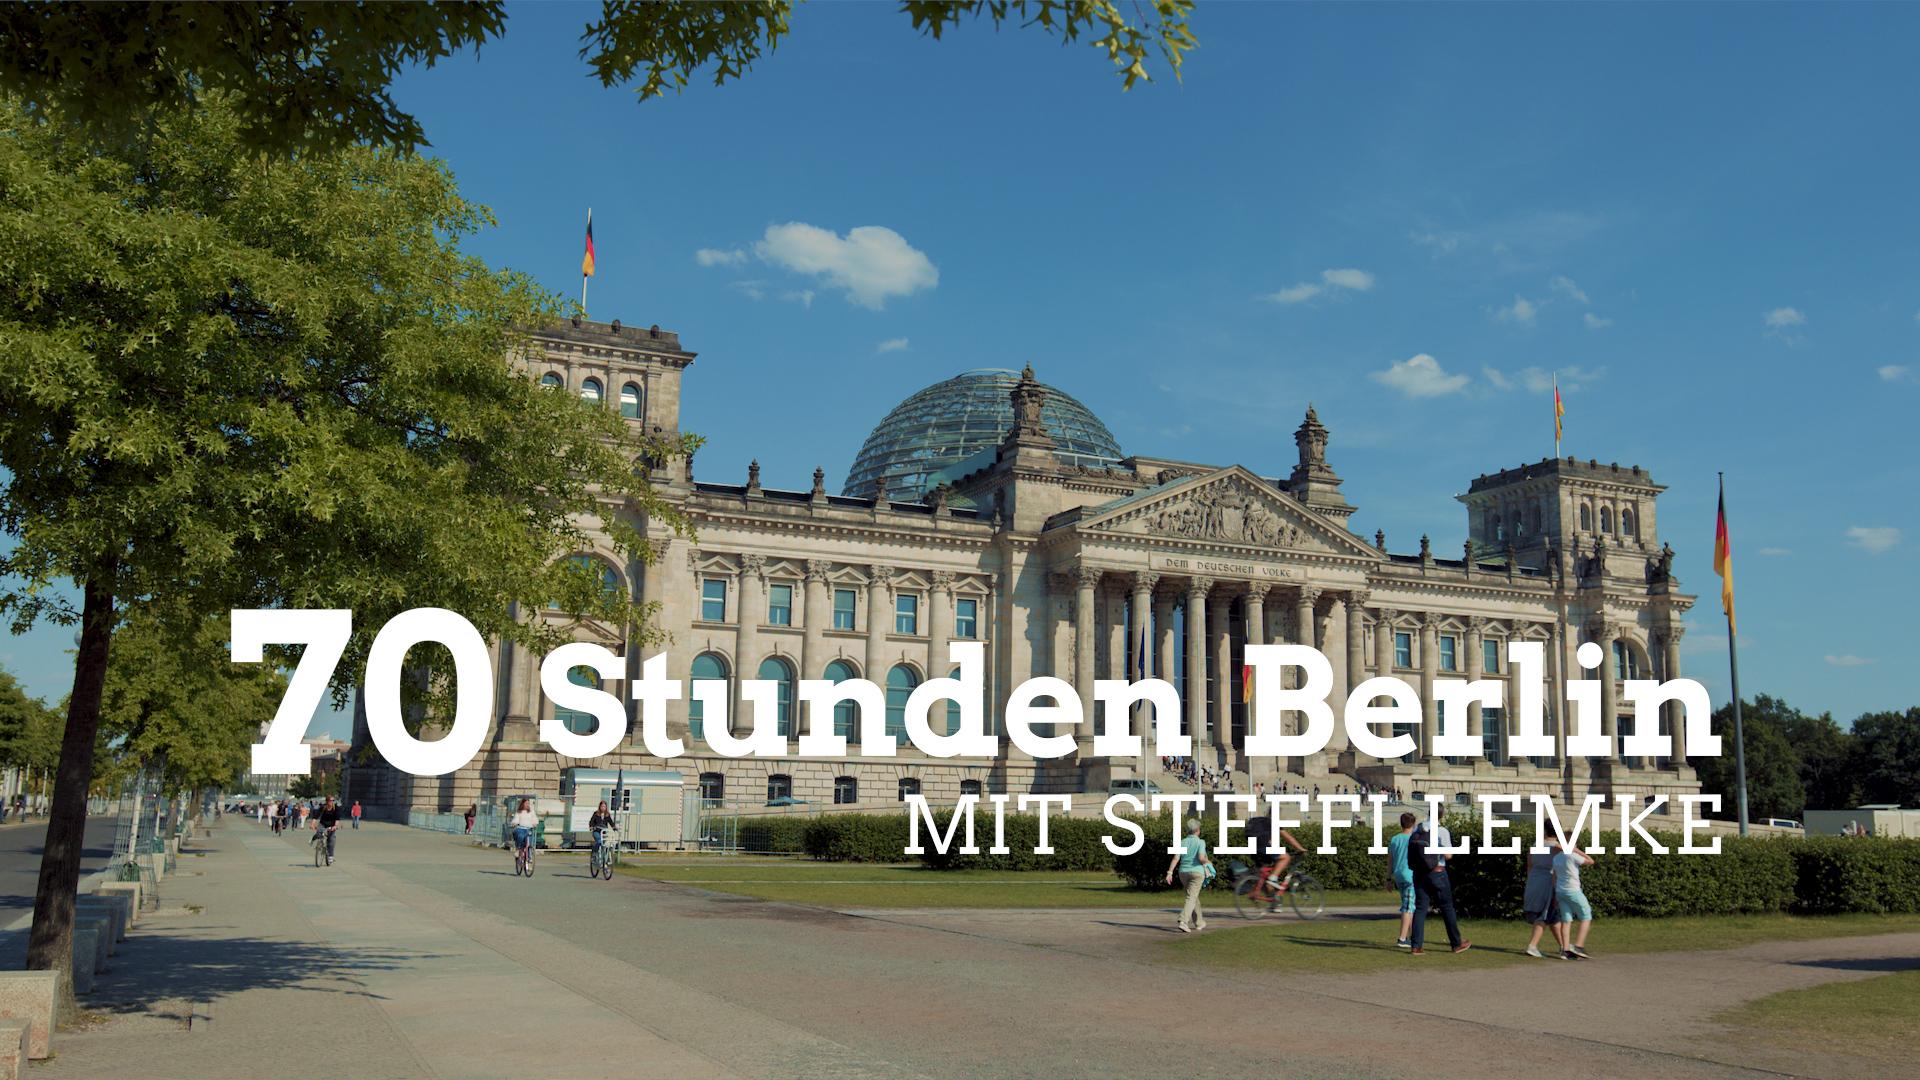 70 Stunden Berlin